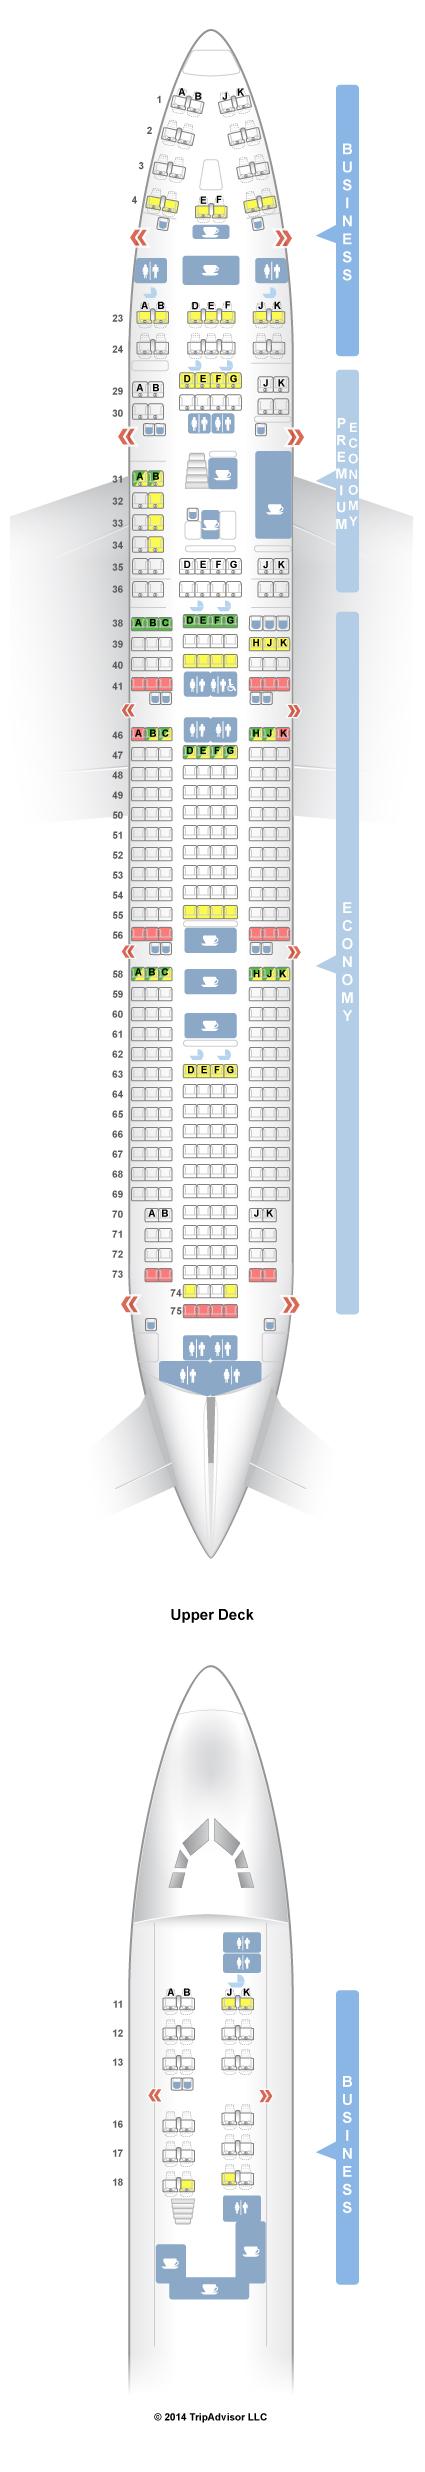 SeatGuru Seat Map Qantas Boeing 747400RR (744) Three